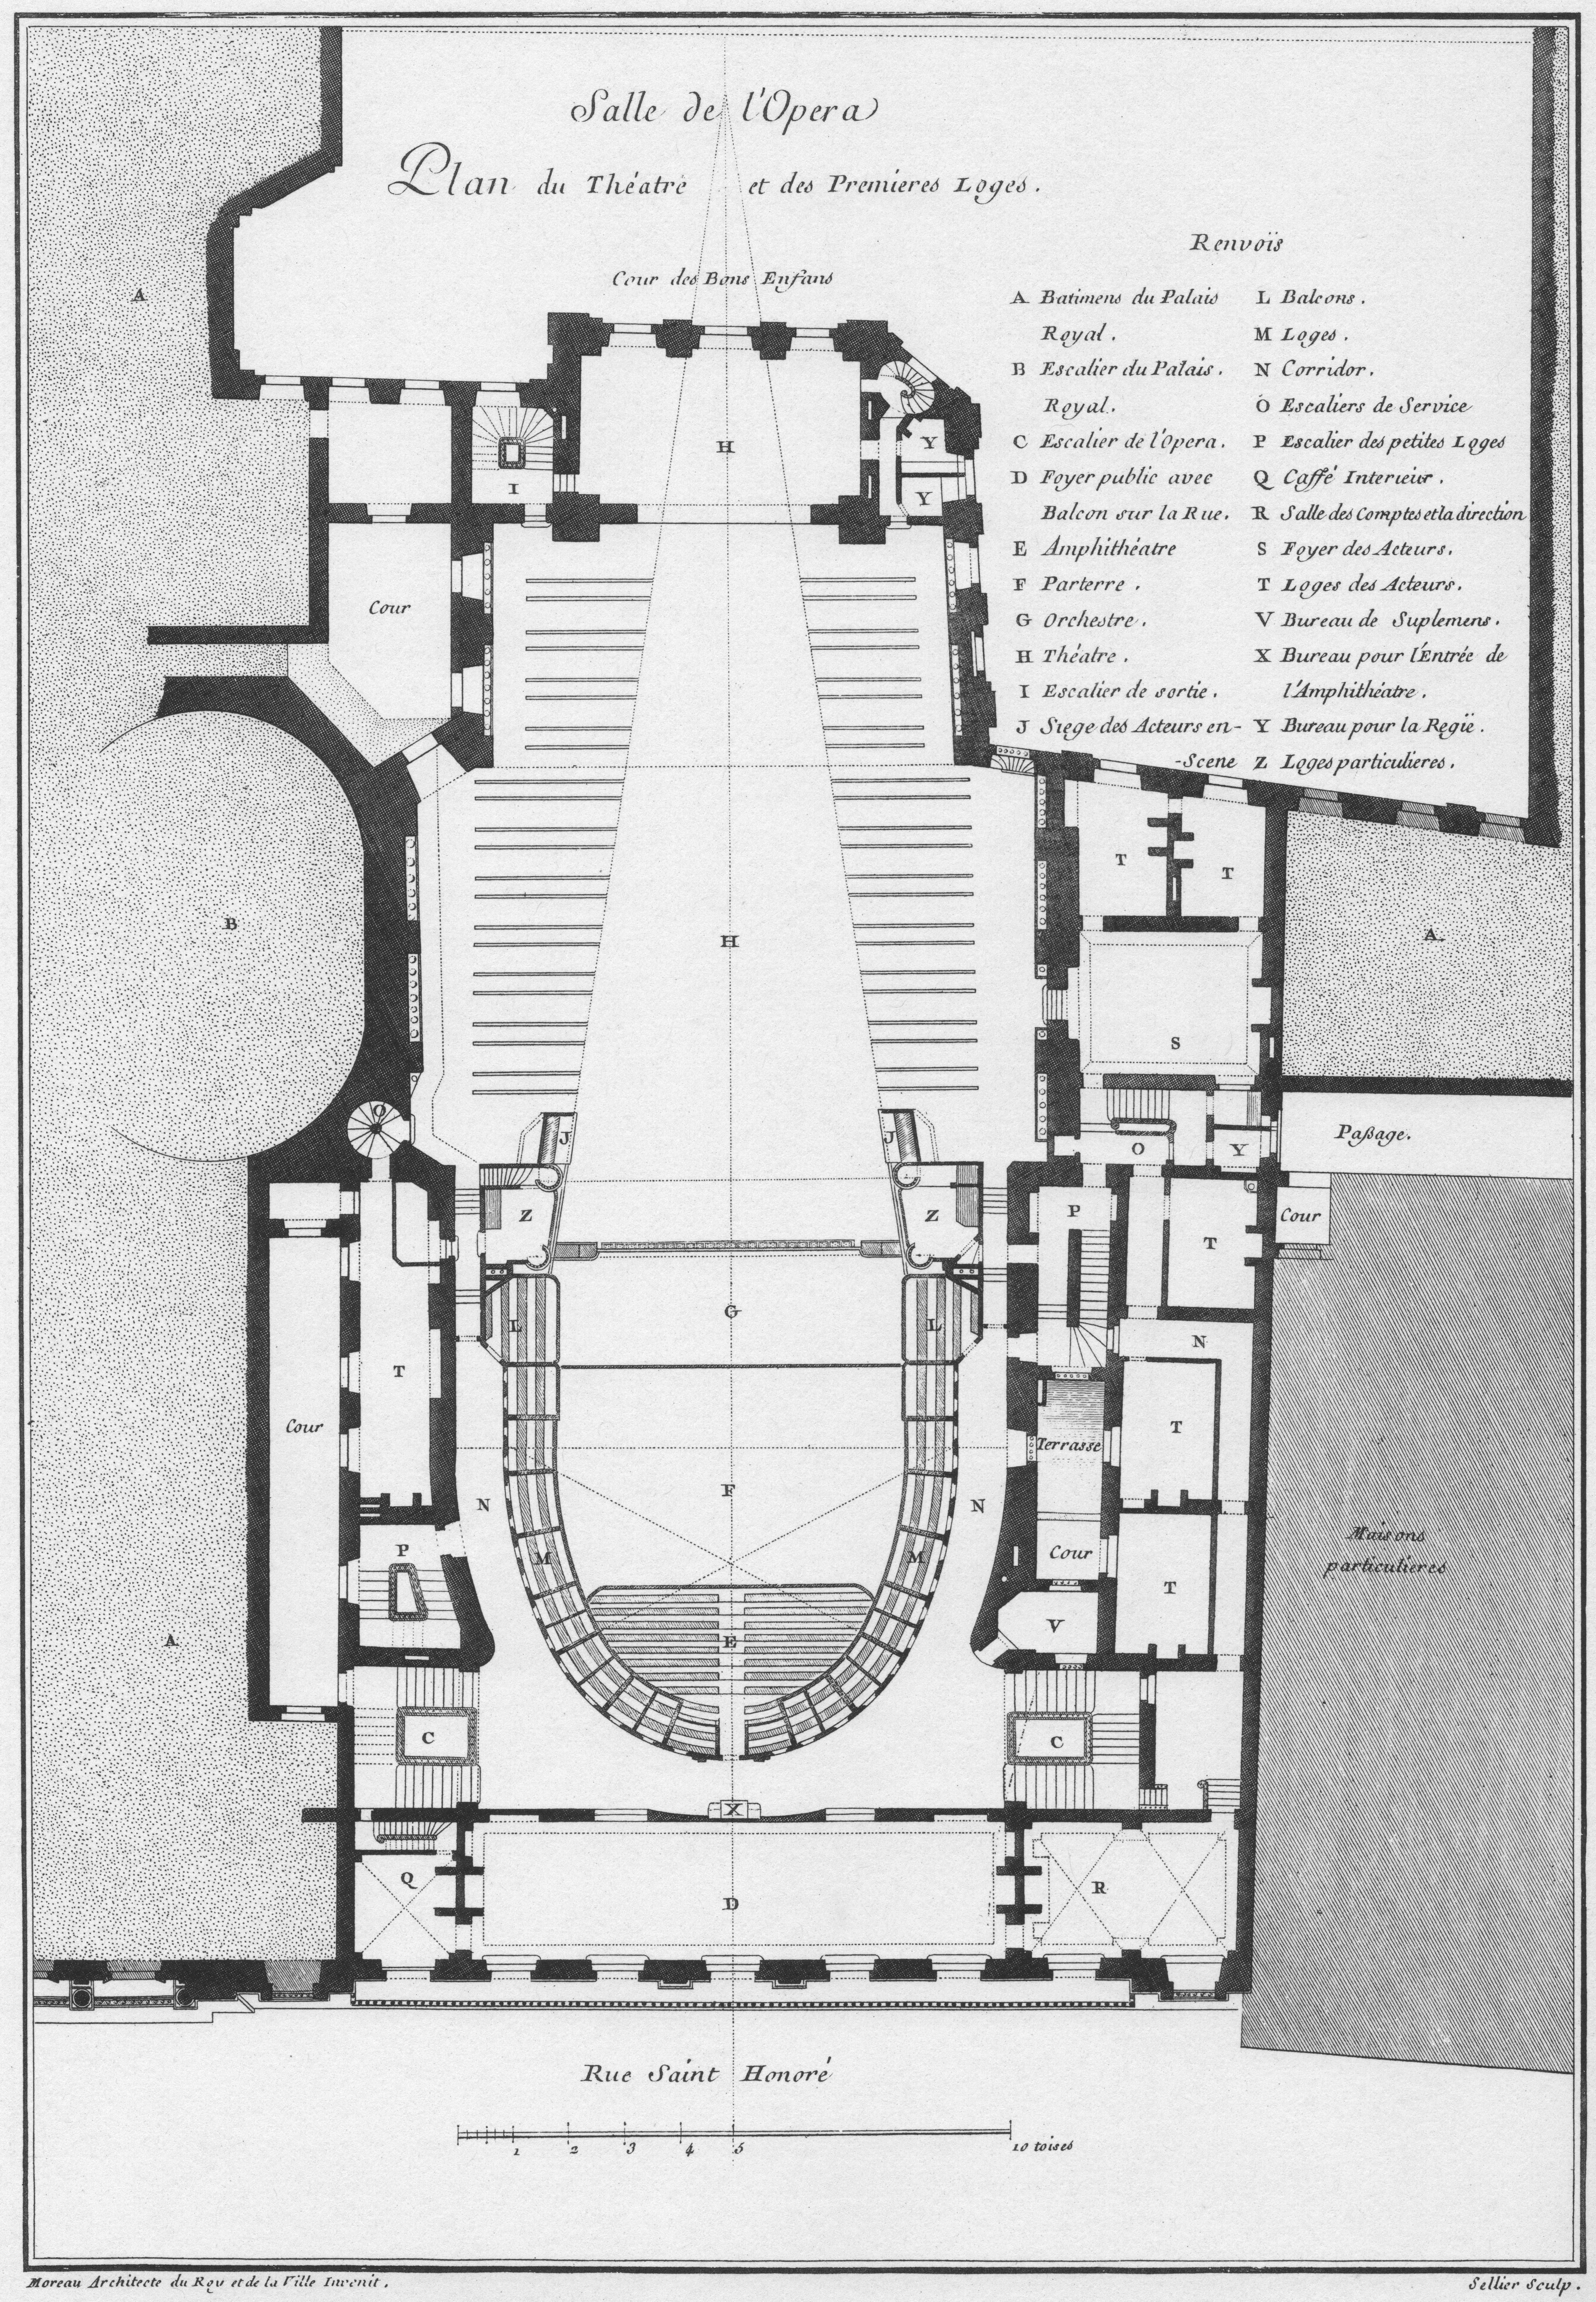 Plan du theatre de la porte saint martin maison design - Plan salle theatre porte saint martin ...